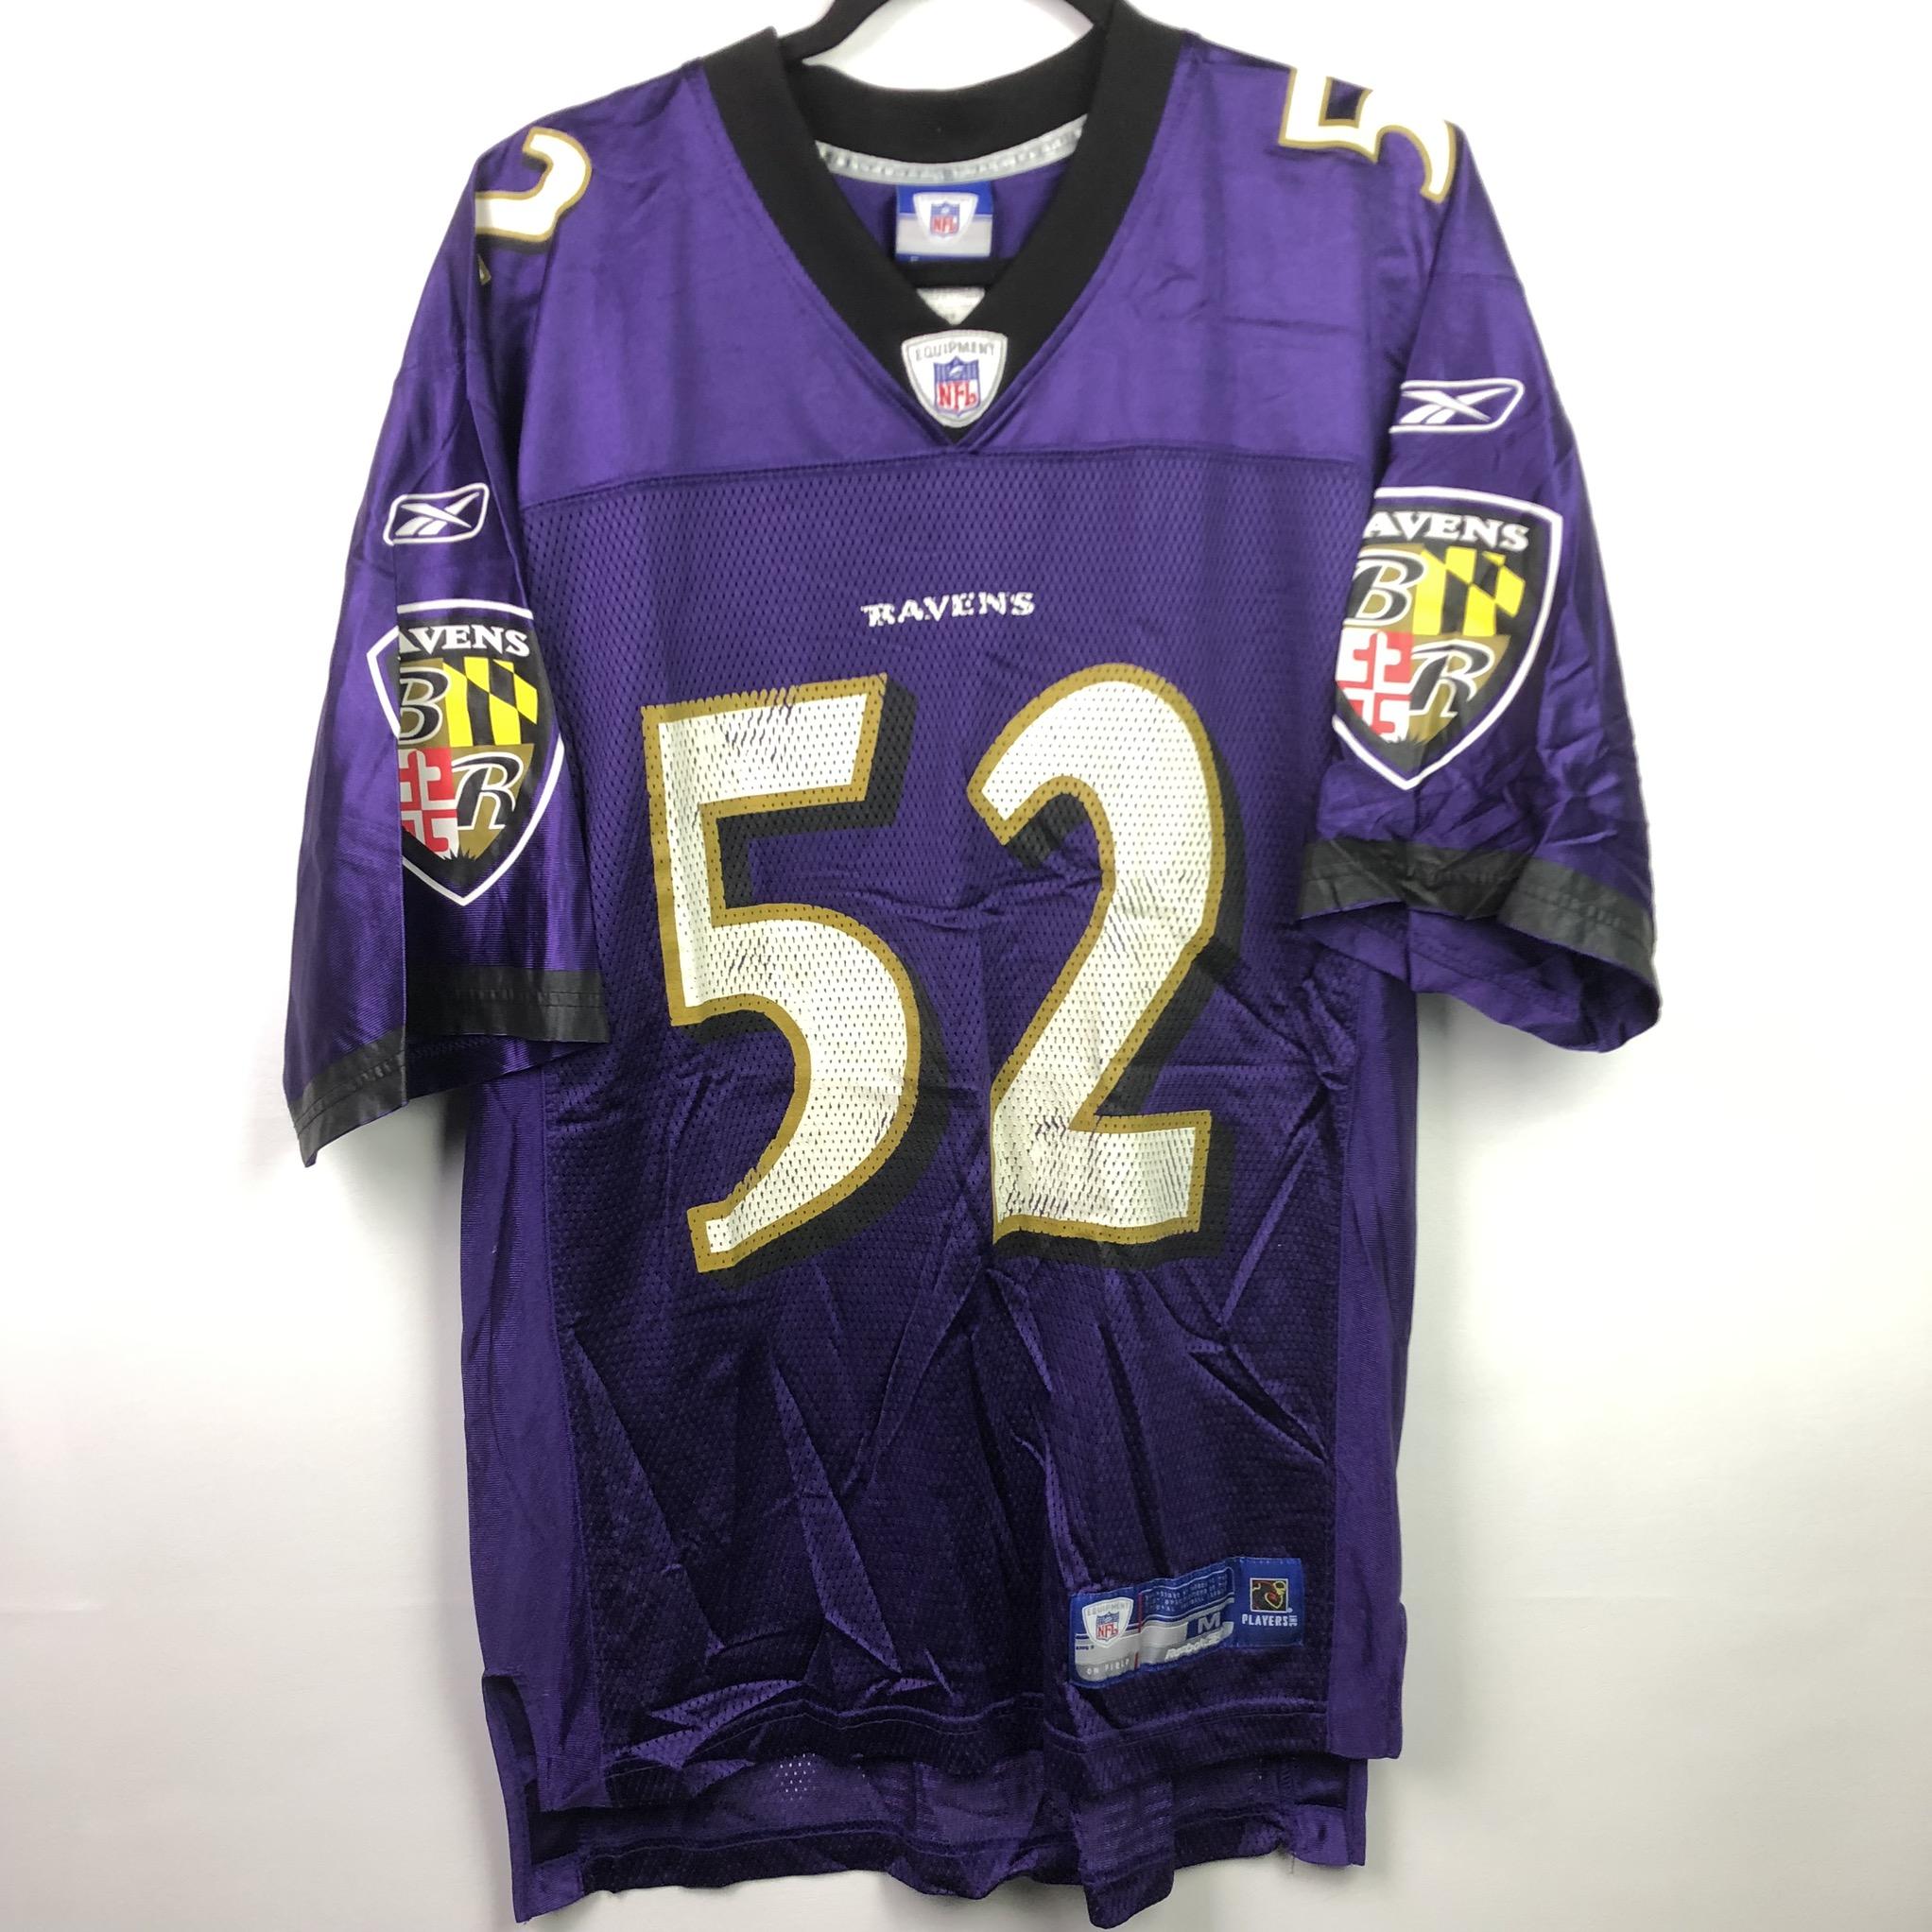 Reebok Reebok Baltimore Ravens Ray Lewis Jersey NFL On Field #52